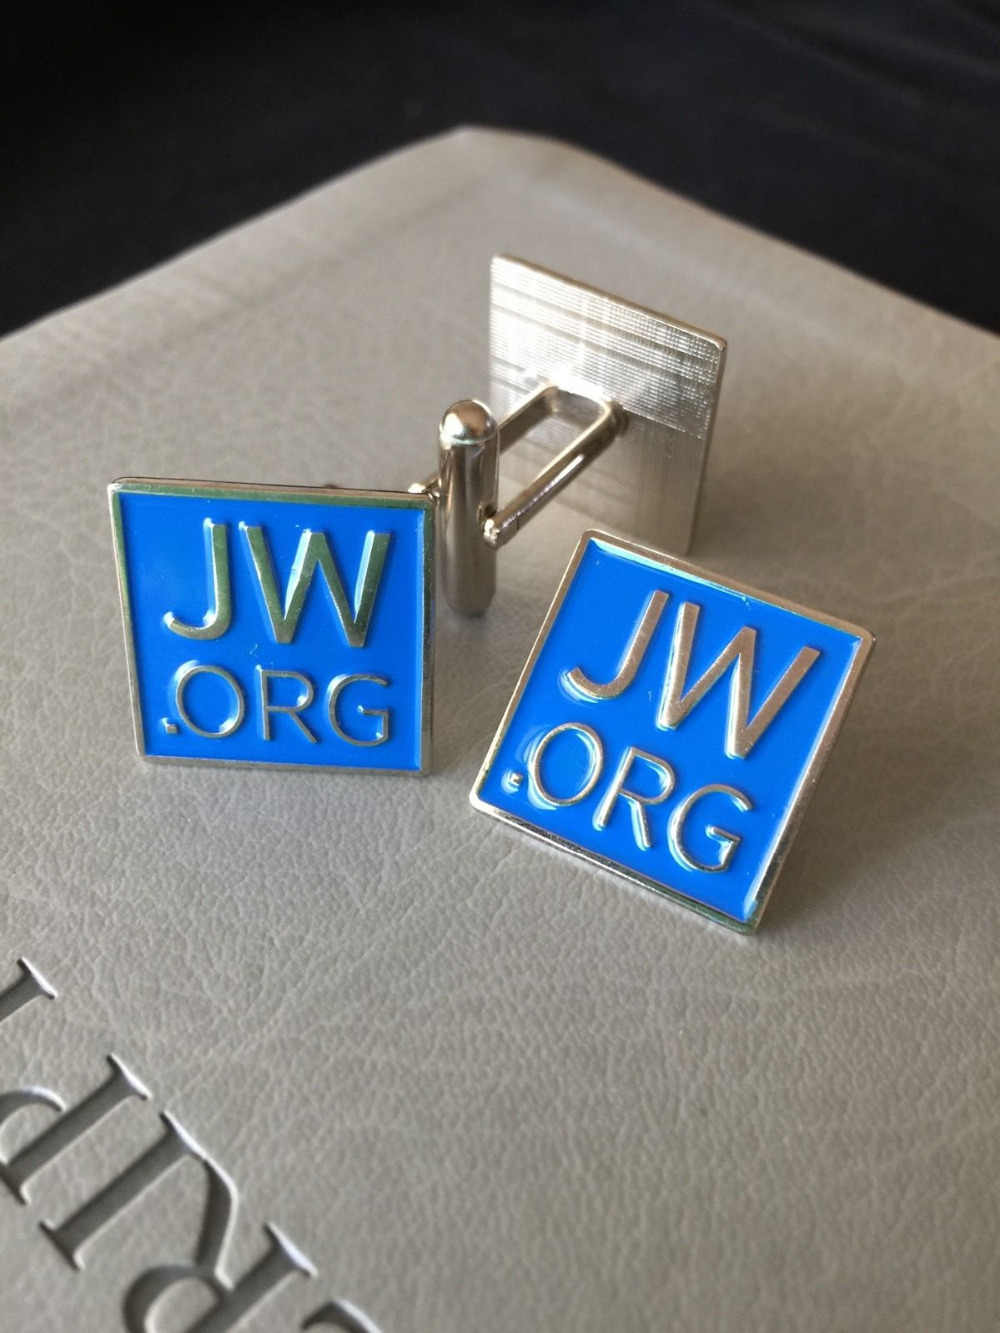 JW Pin dan Kancing Manset Set Paduan dengan Biru Emblem jw.org